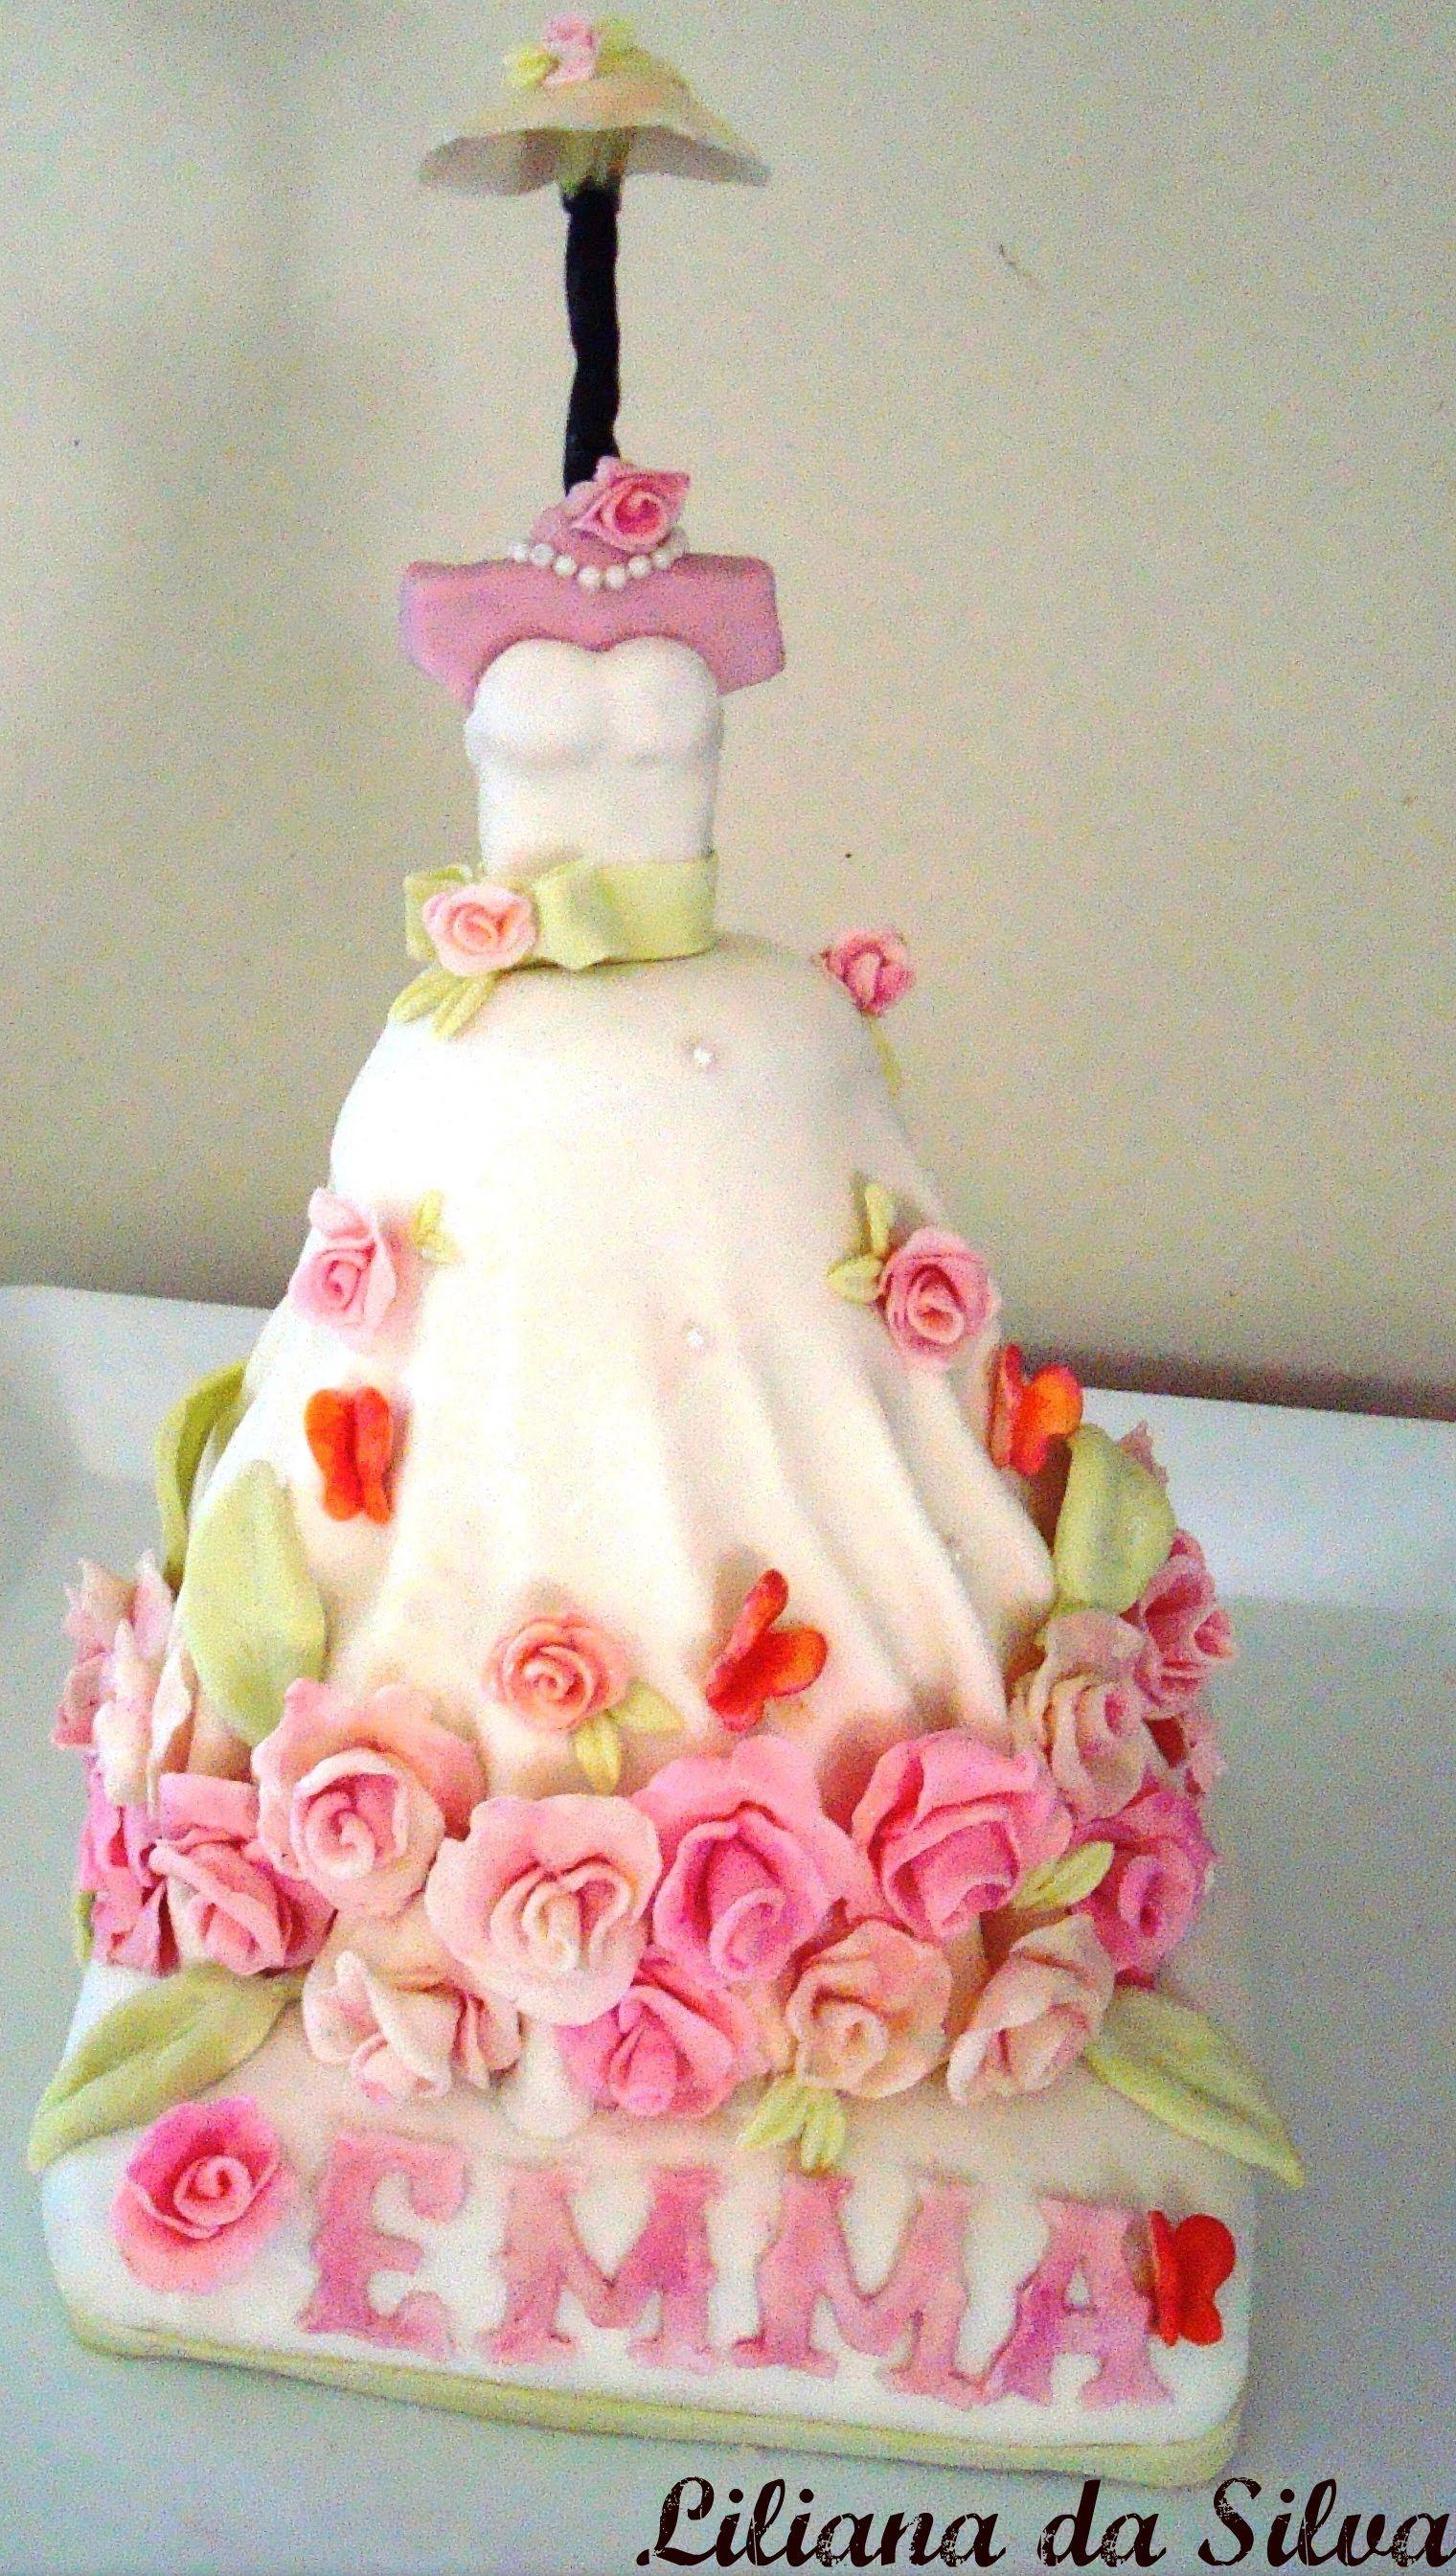 Fondant Cake Decorating - Making a doll cake | Decorating ...